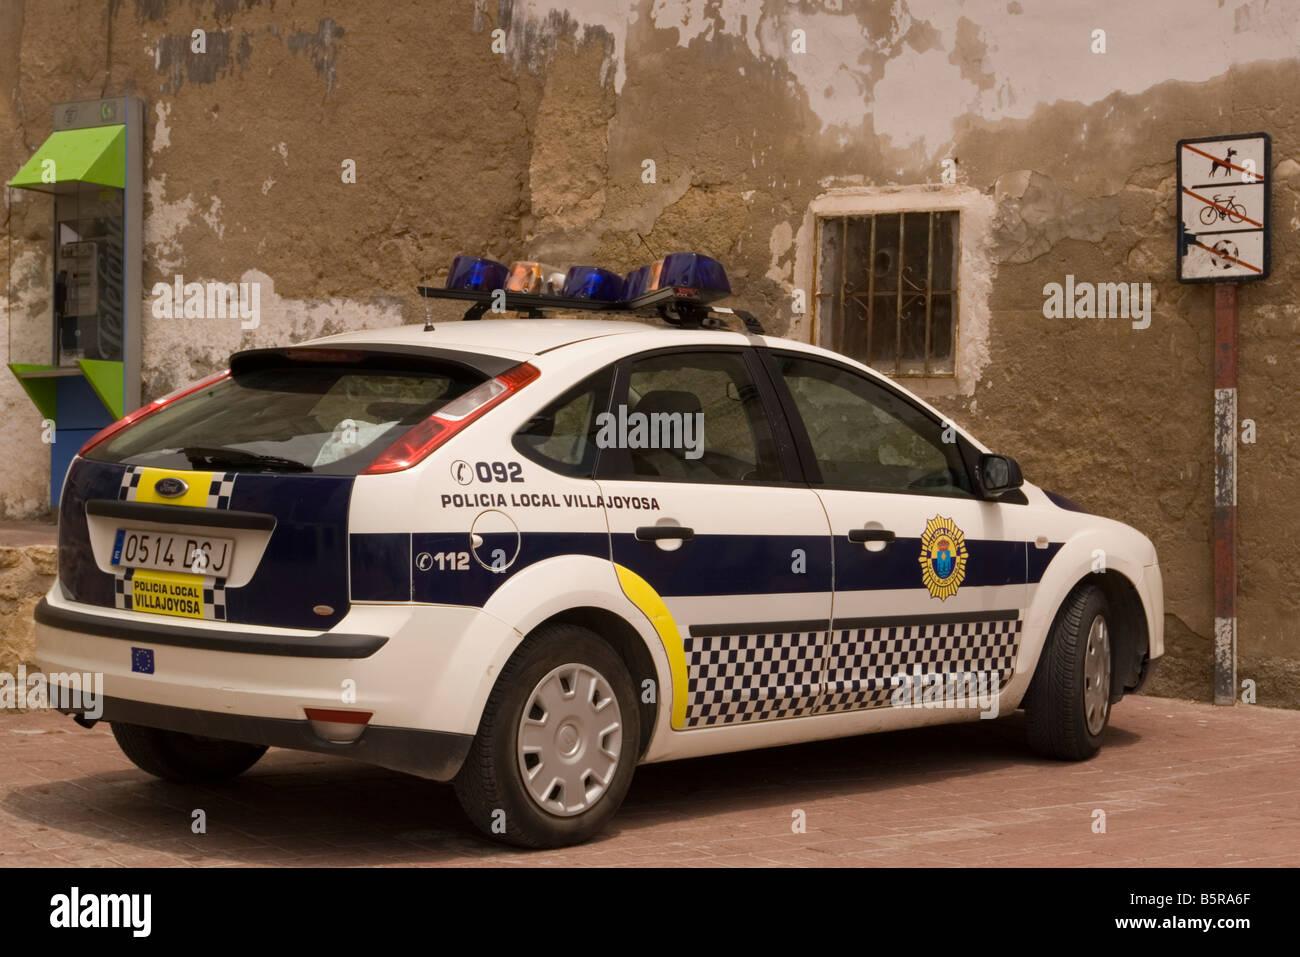 Spanish Police Car Spain Policia Local Stock Photo 20796567 Alamy